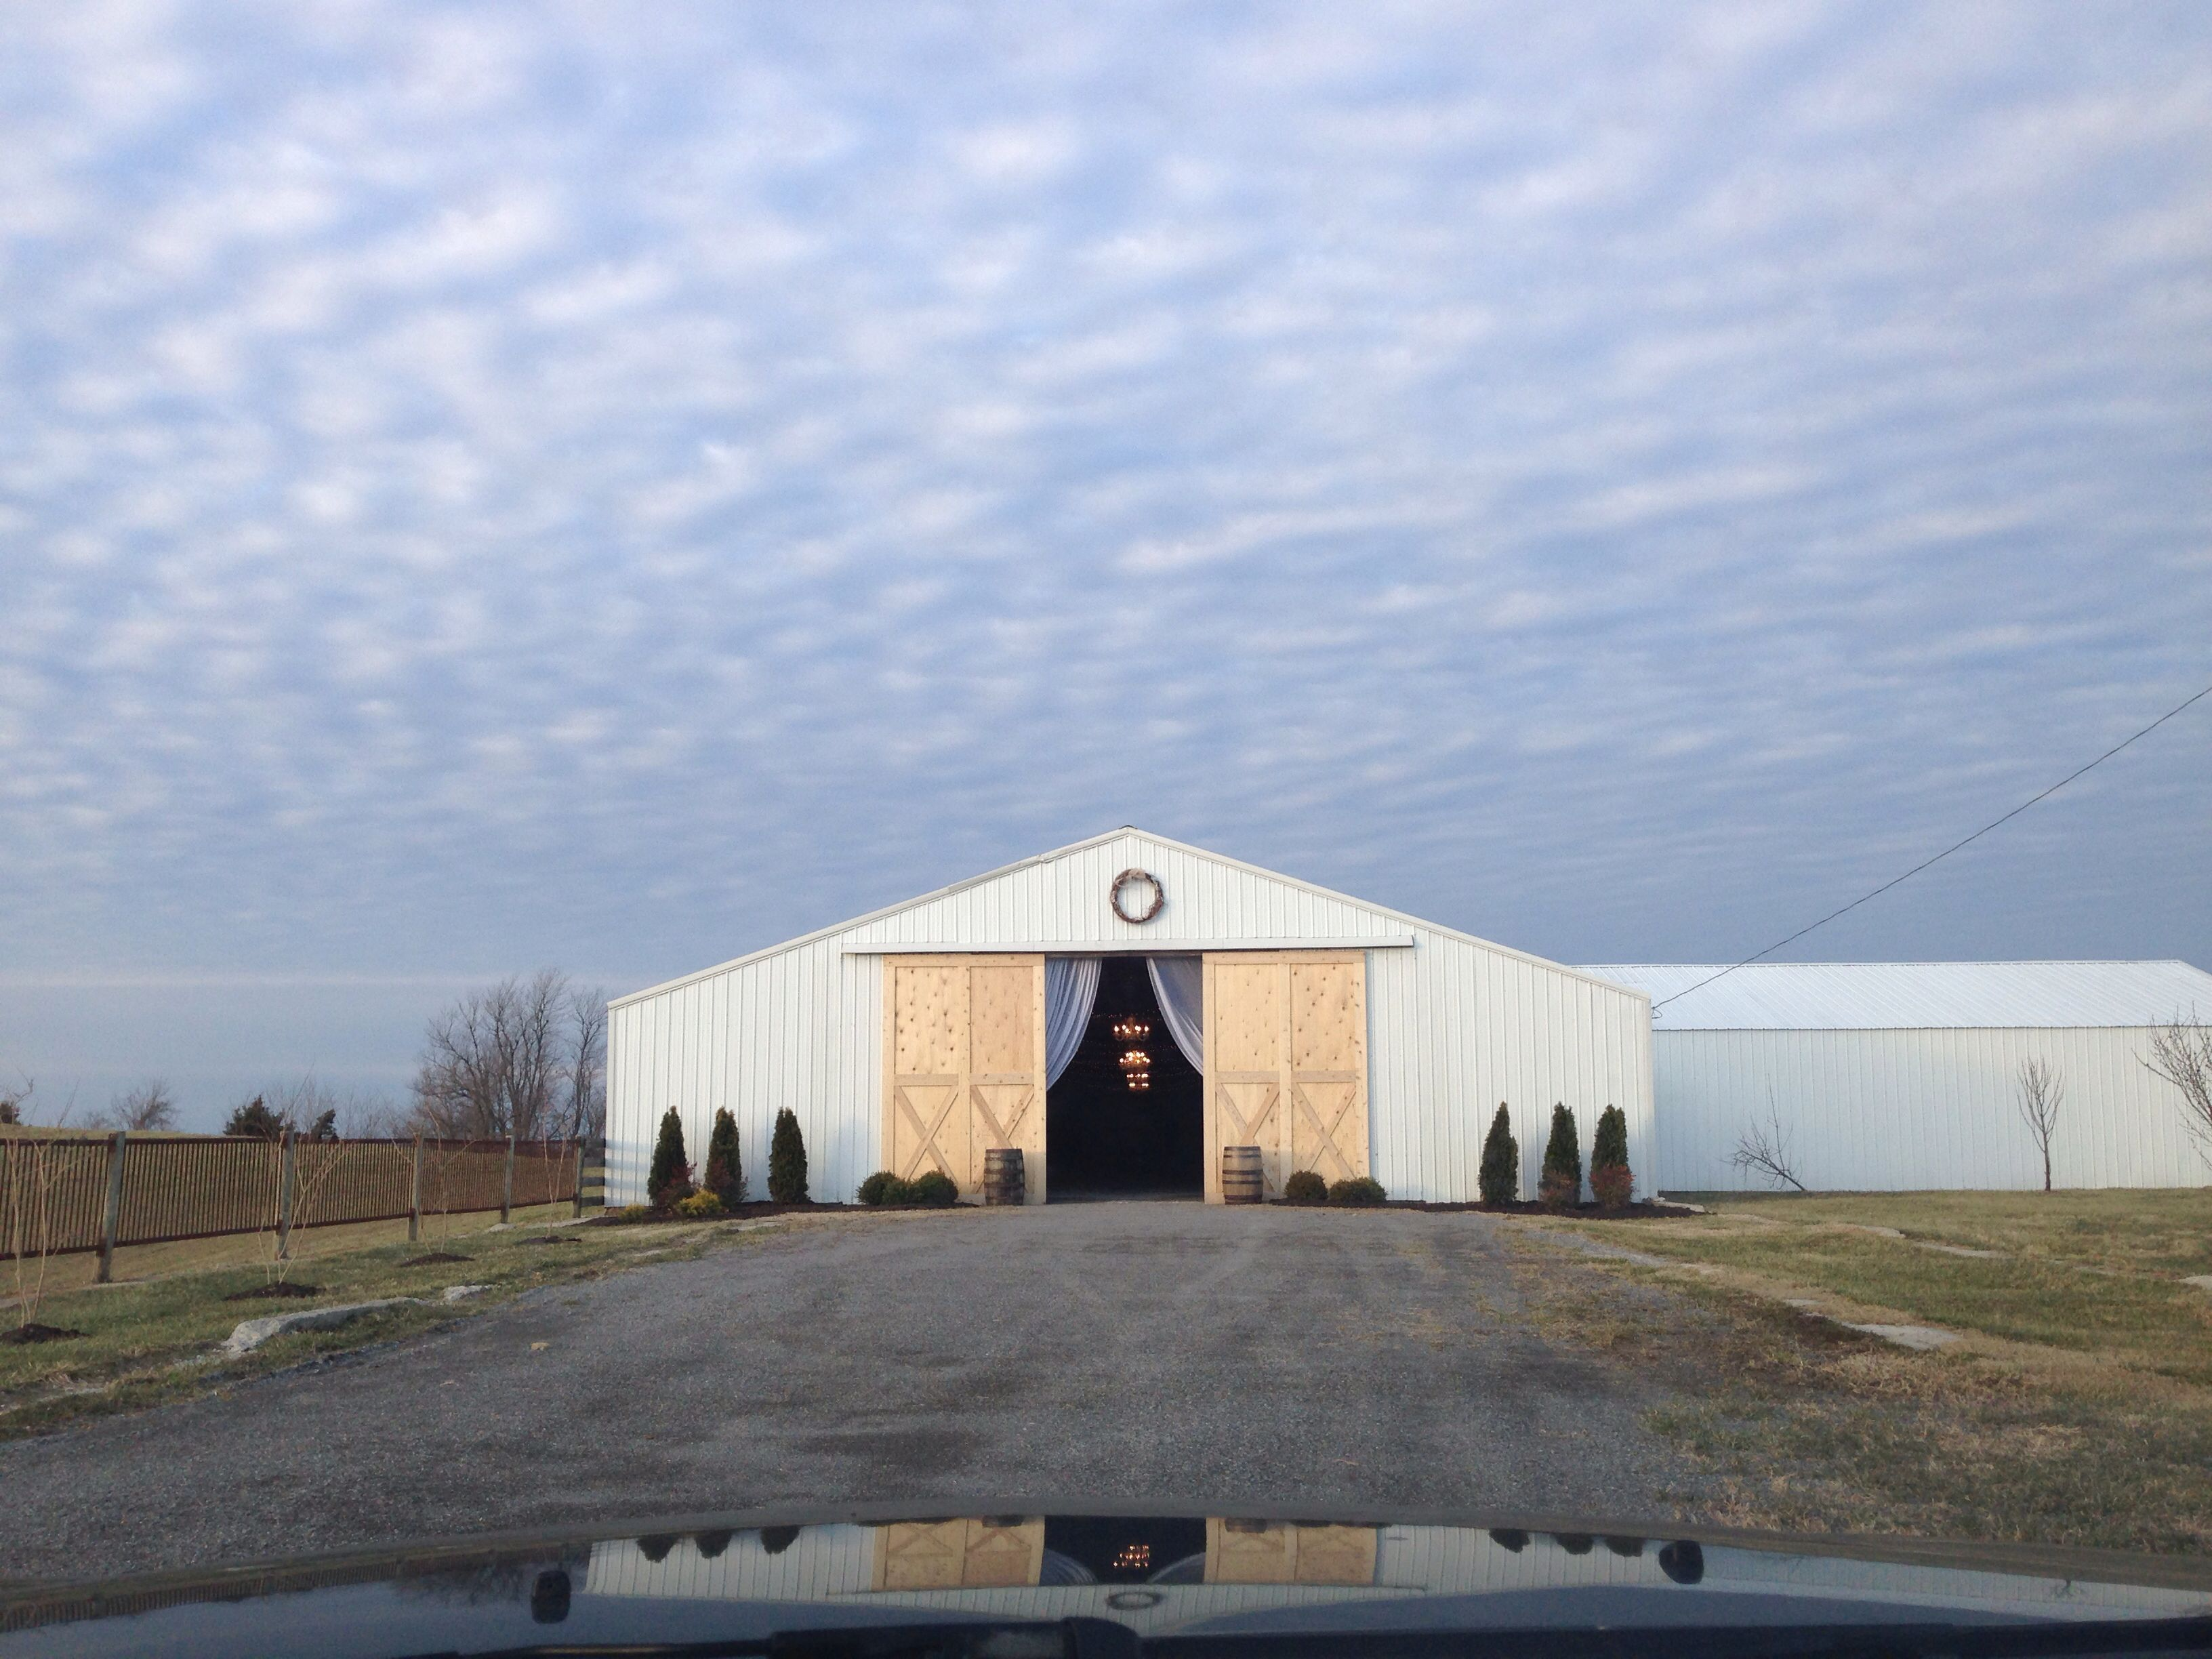 The Bluegr Wedding Barn Where It Will Be